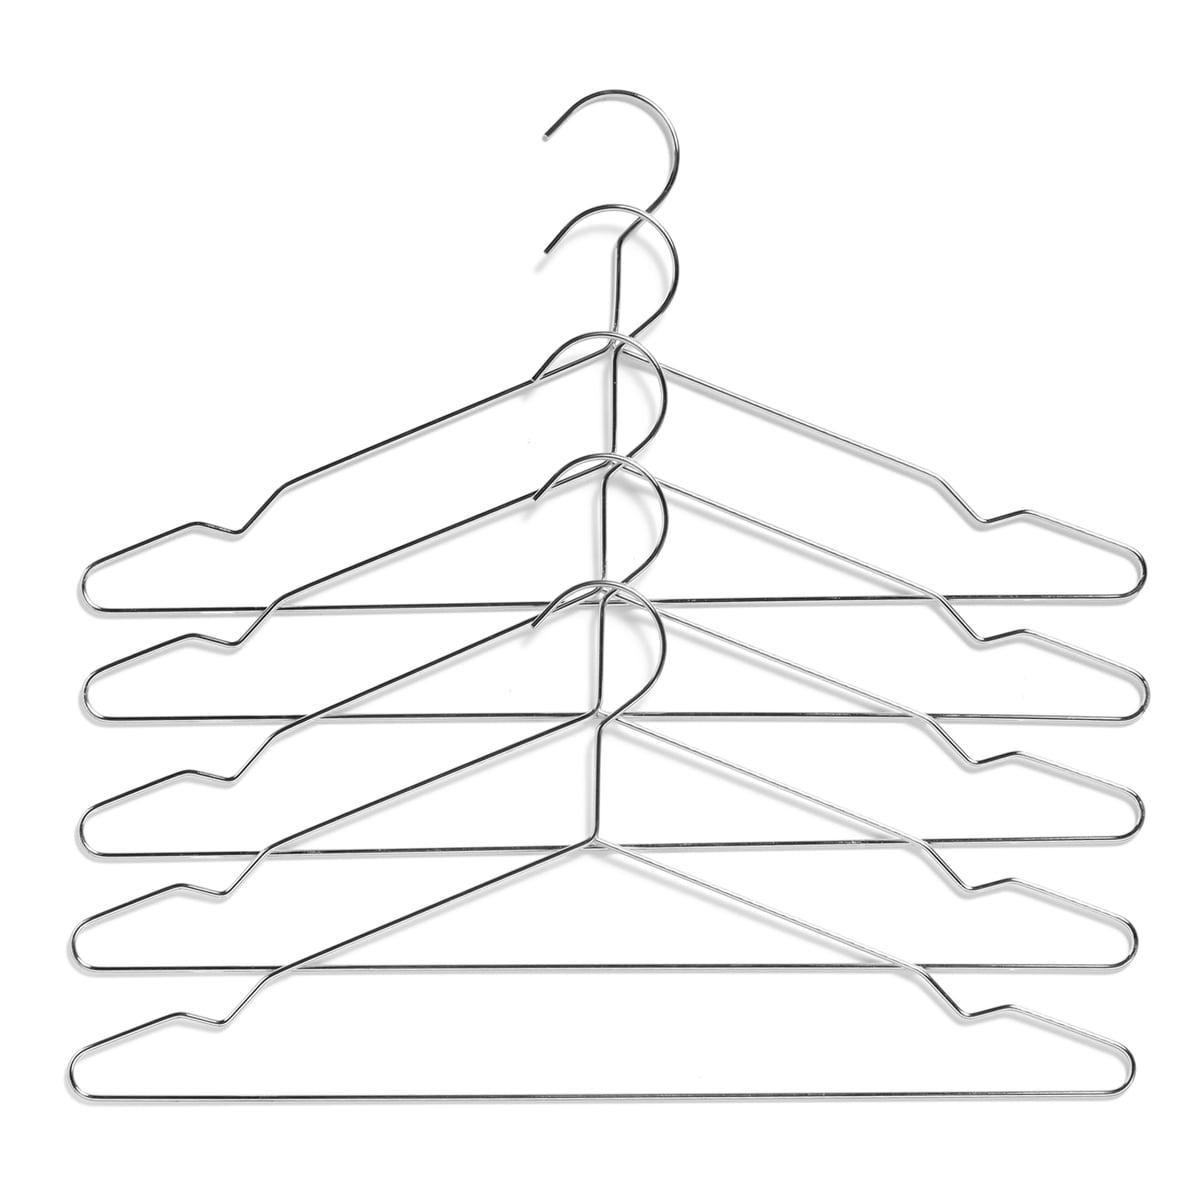 Hay - Hang Kleiderbügel, 5er-Set, silber | Flur & Diele > Garderoben > Kleiderbügel | Silber | Hay